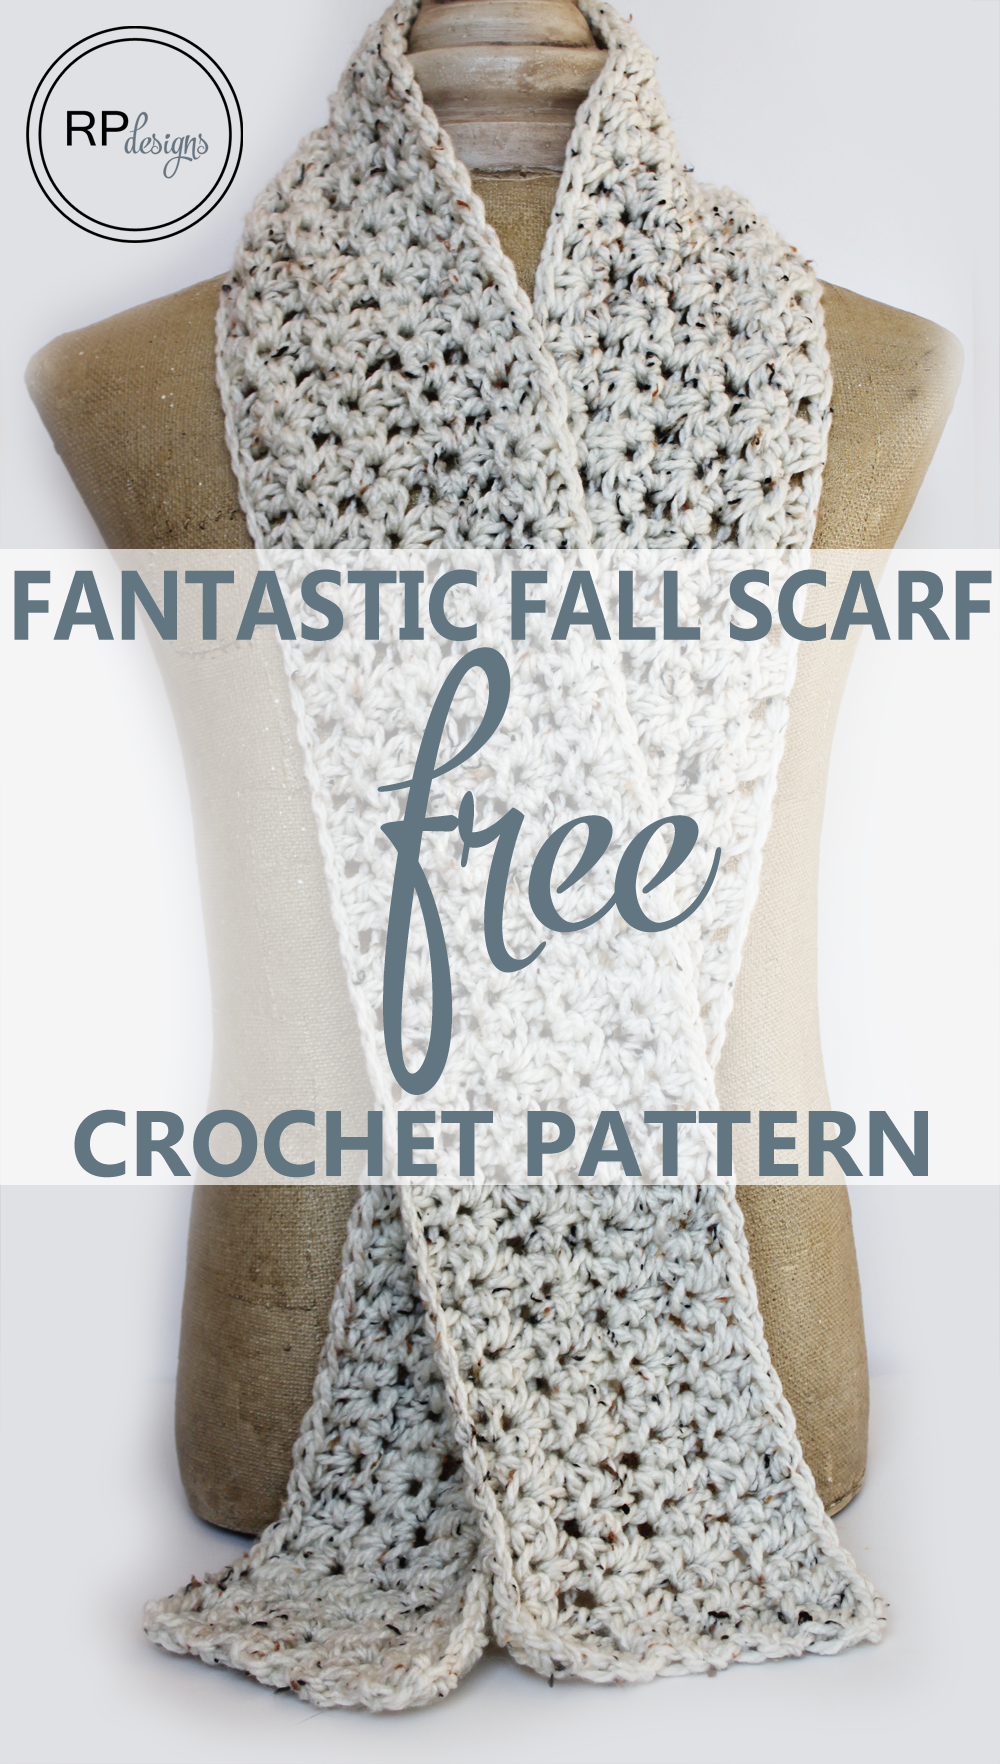 Fantastic Fall Scarf - Crochet Pattern - Rescued Paw Designs ...